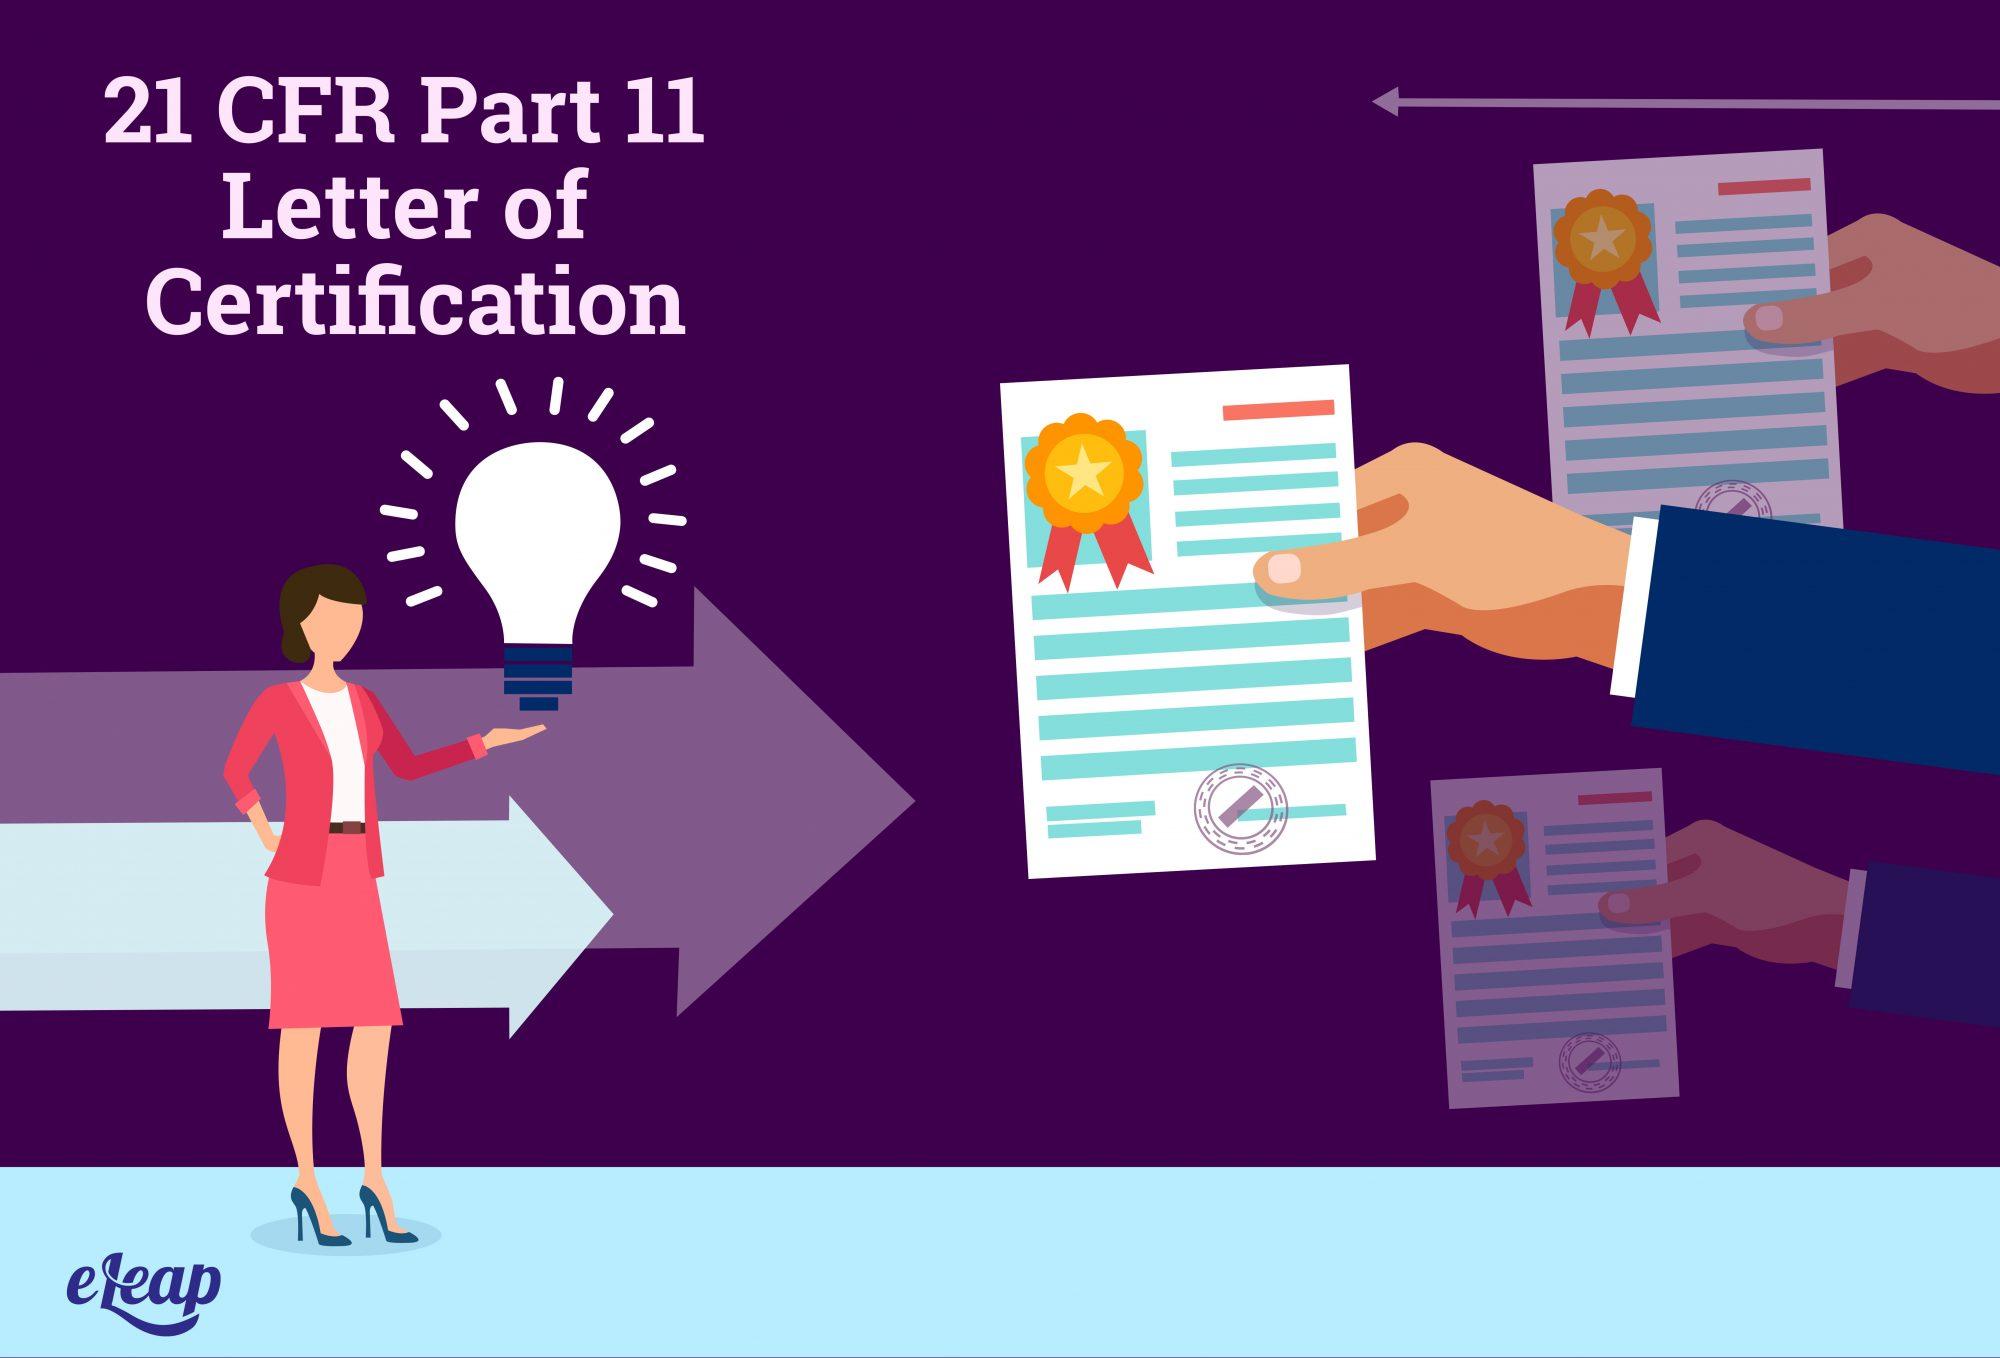 21 CFR Part 11 Letter of Certification